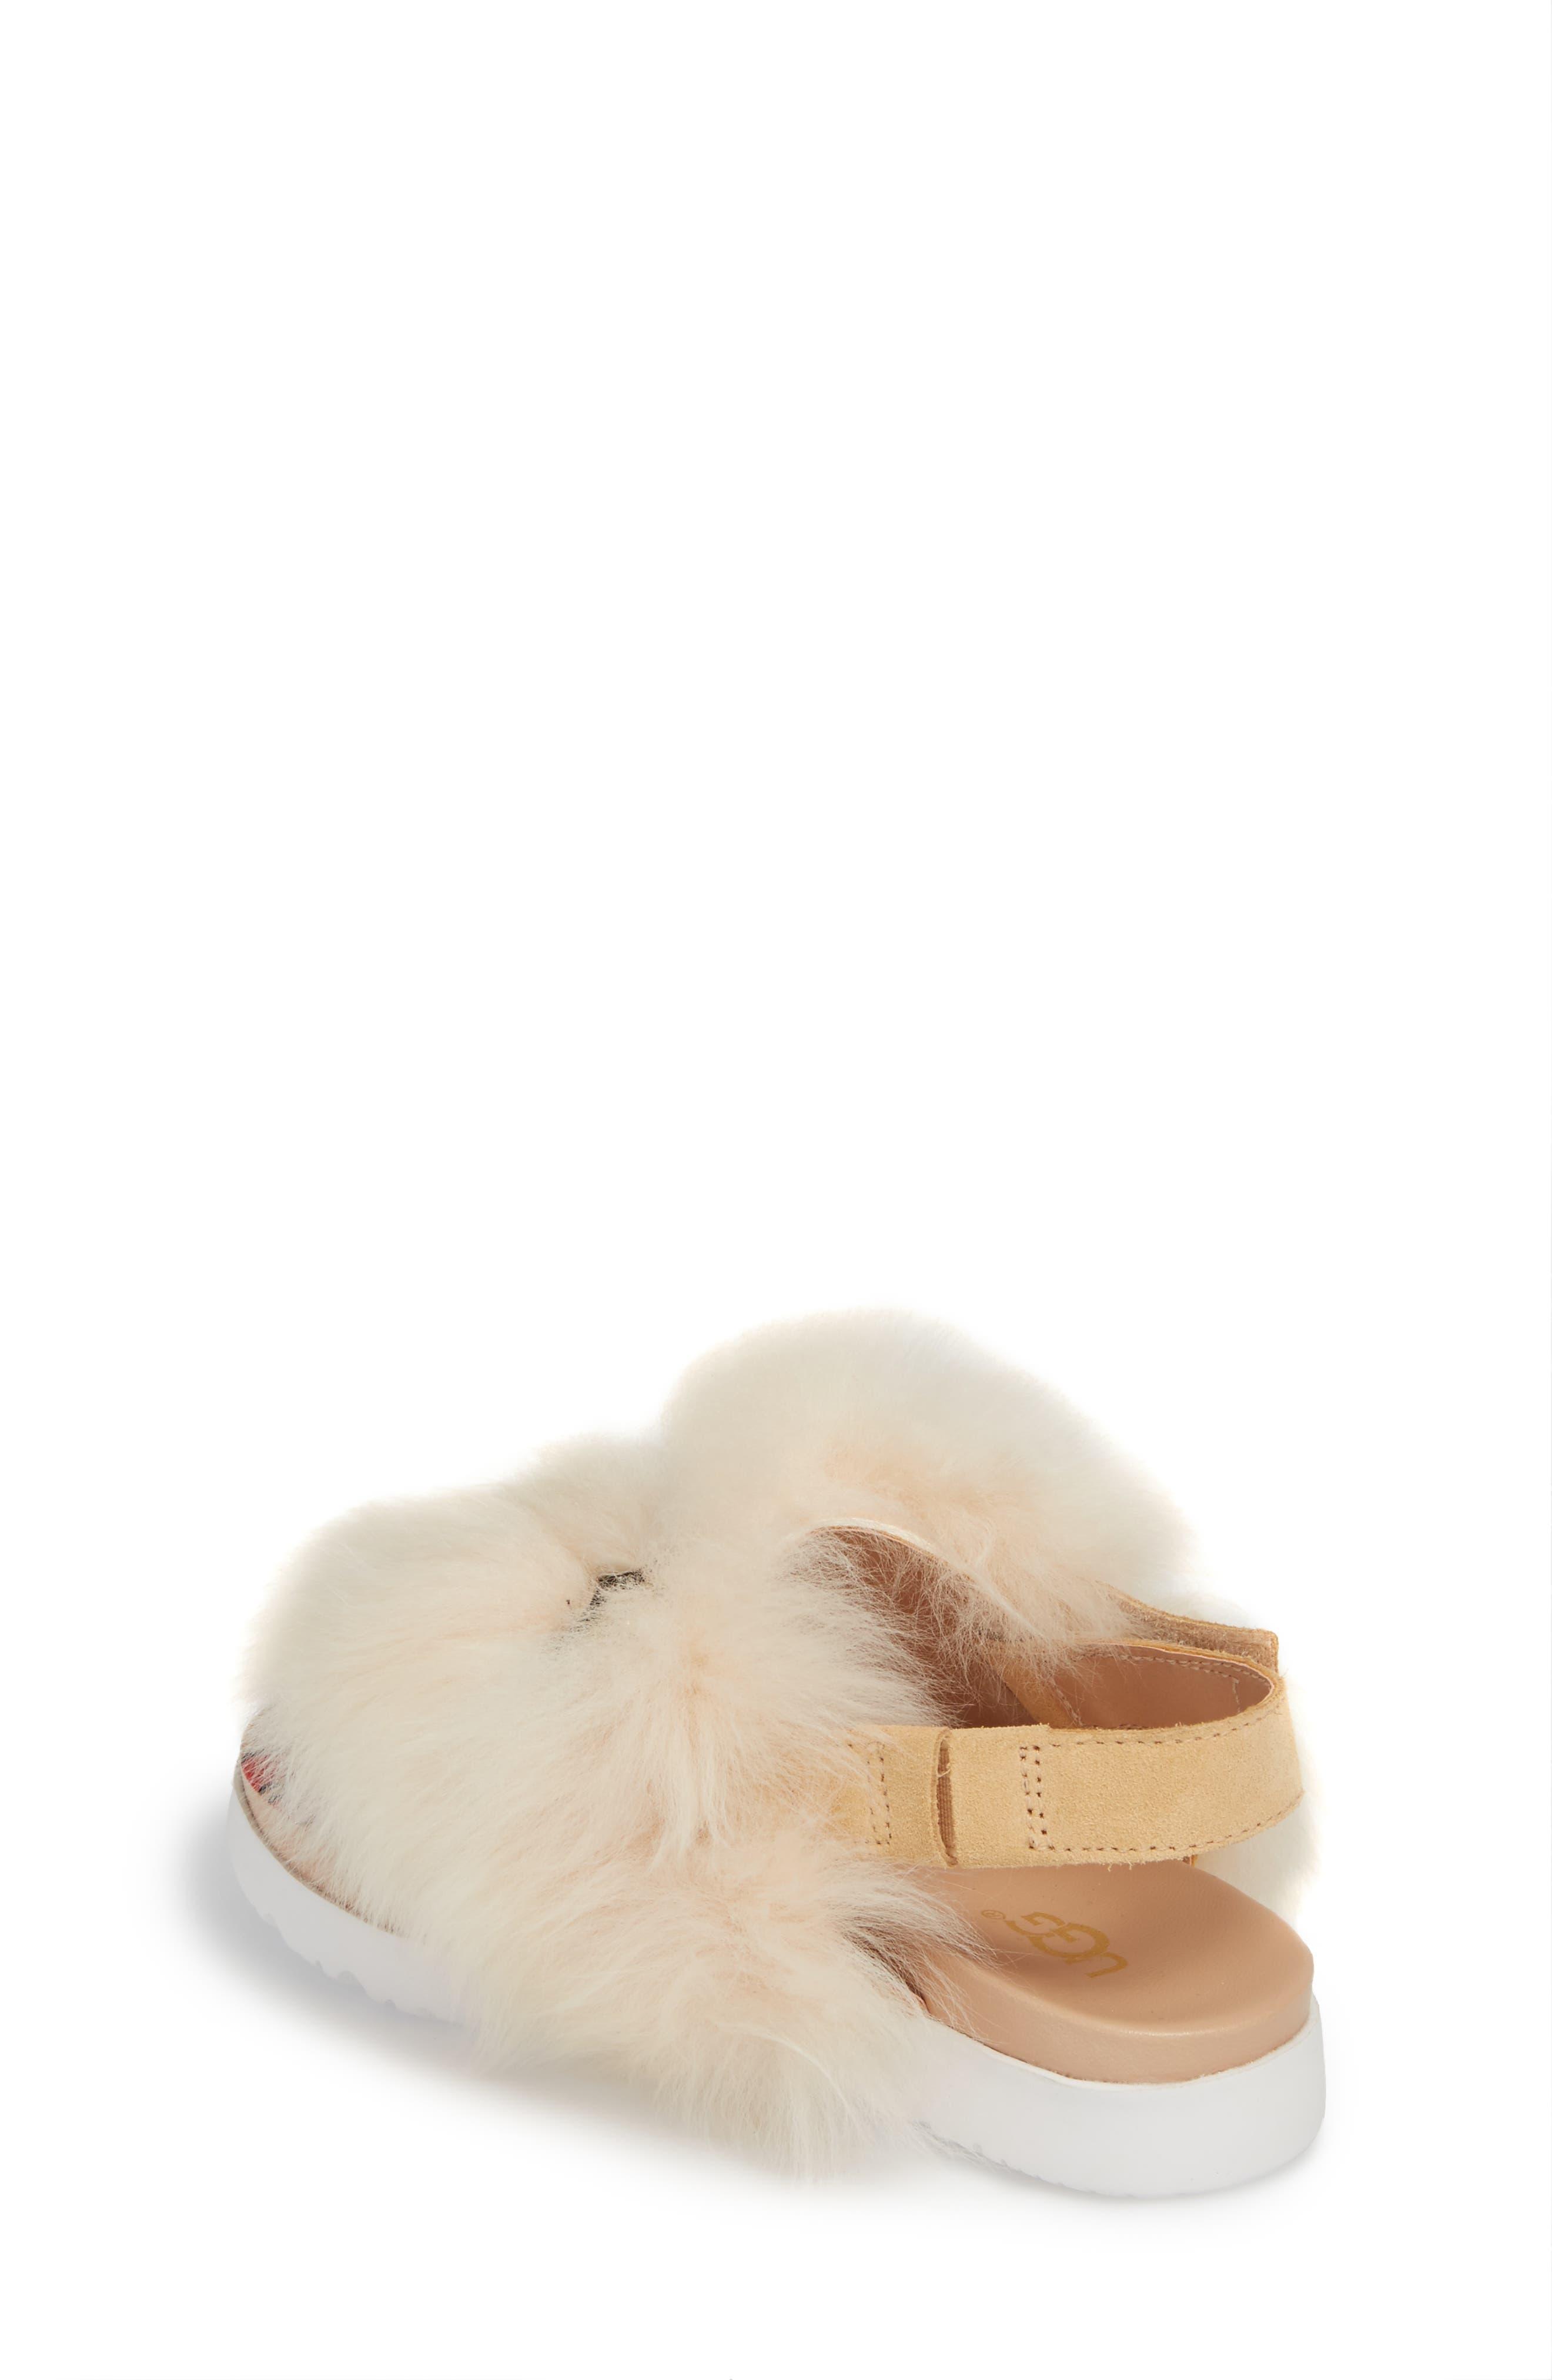 Punki Genuine Shearling Sandal,                             Alternate thumbnail 2, color,                             Natural/ Soft Ochre